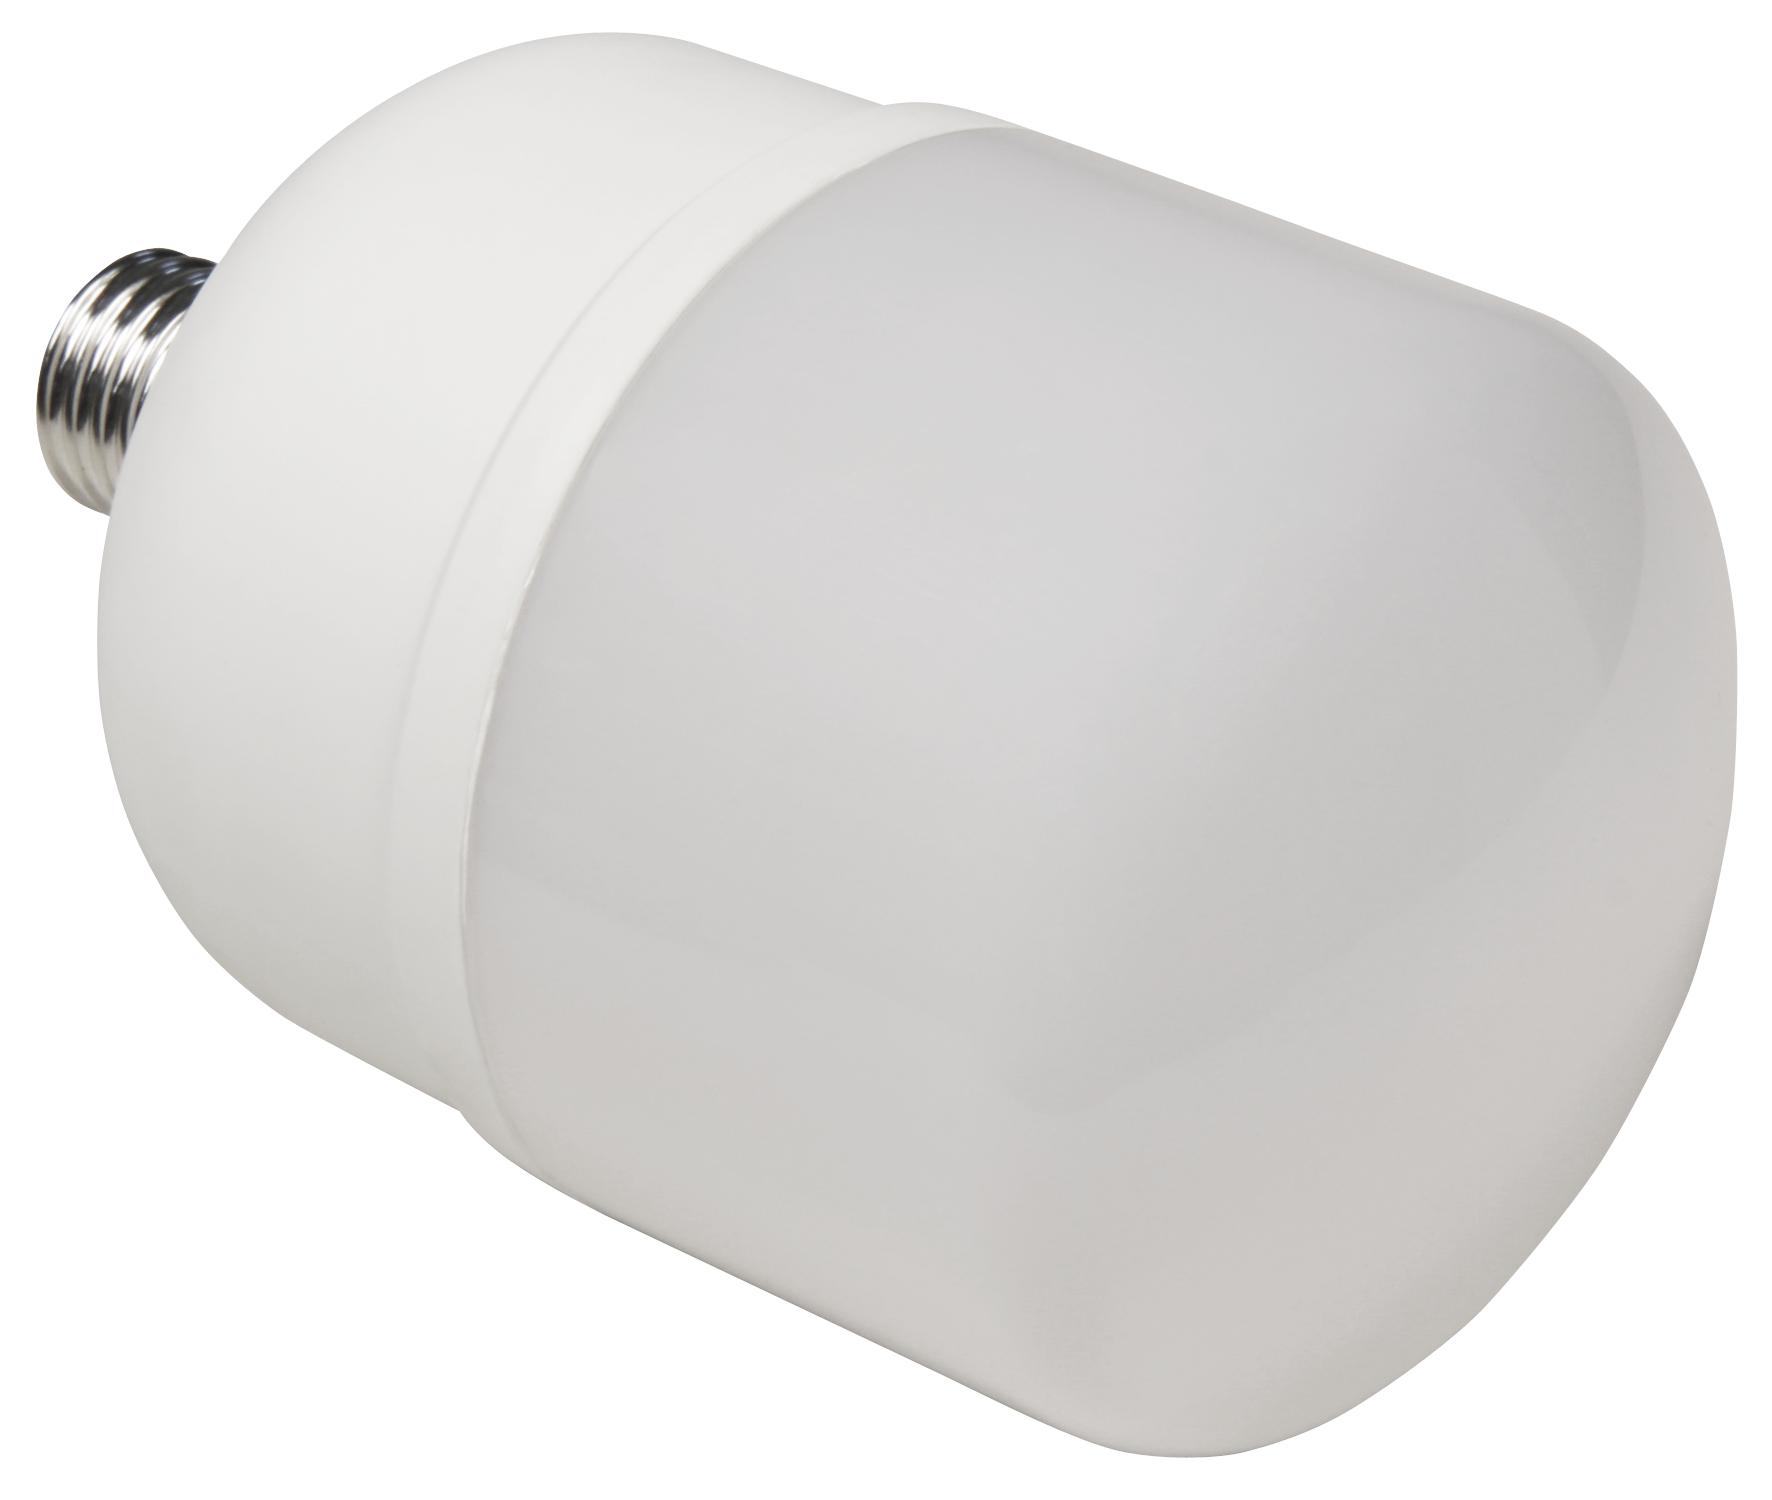 LED Lampe McShine ''BIG30'' E27, 30W, 2800lm, 100x191mm, neutralweiß